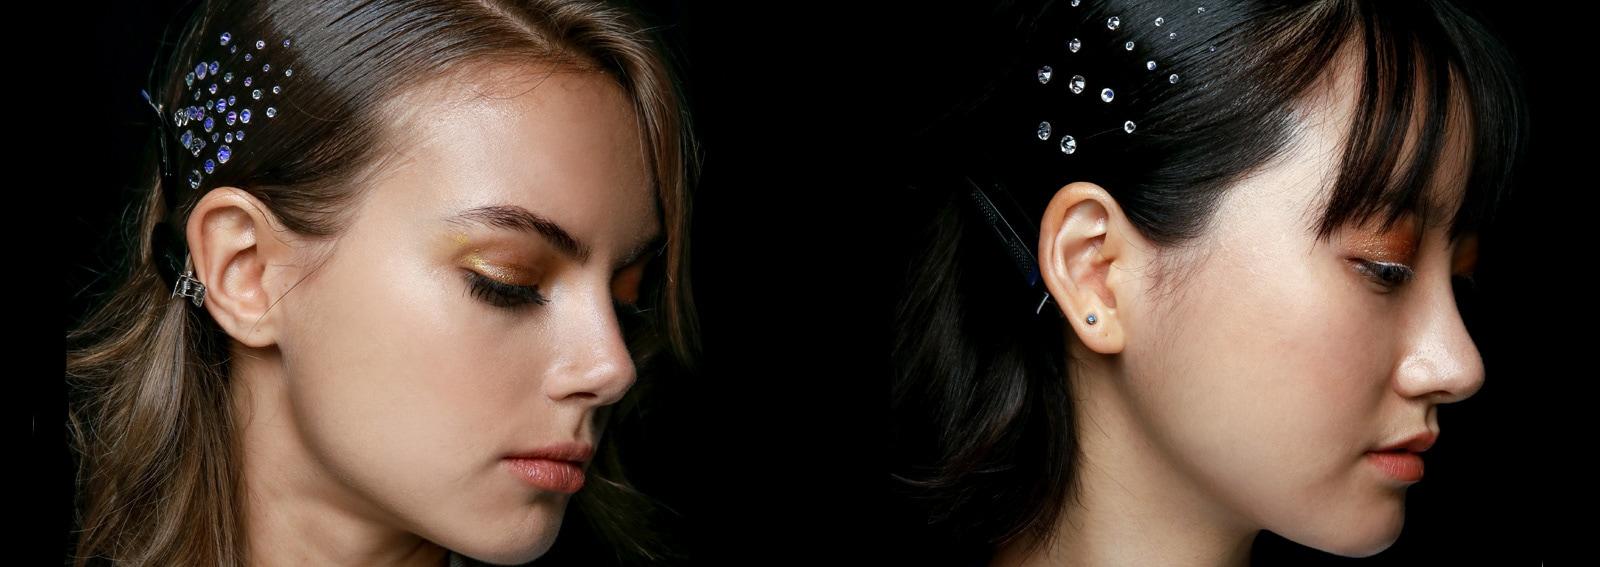 crystal-hair-capelli-con-strass-cristali-acconciature-cover-desktop